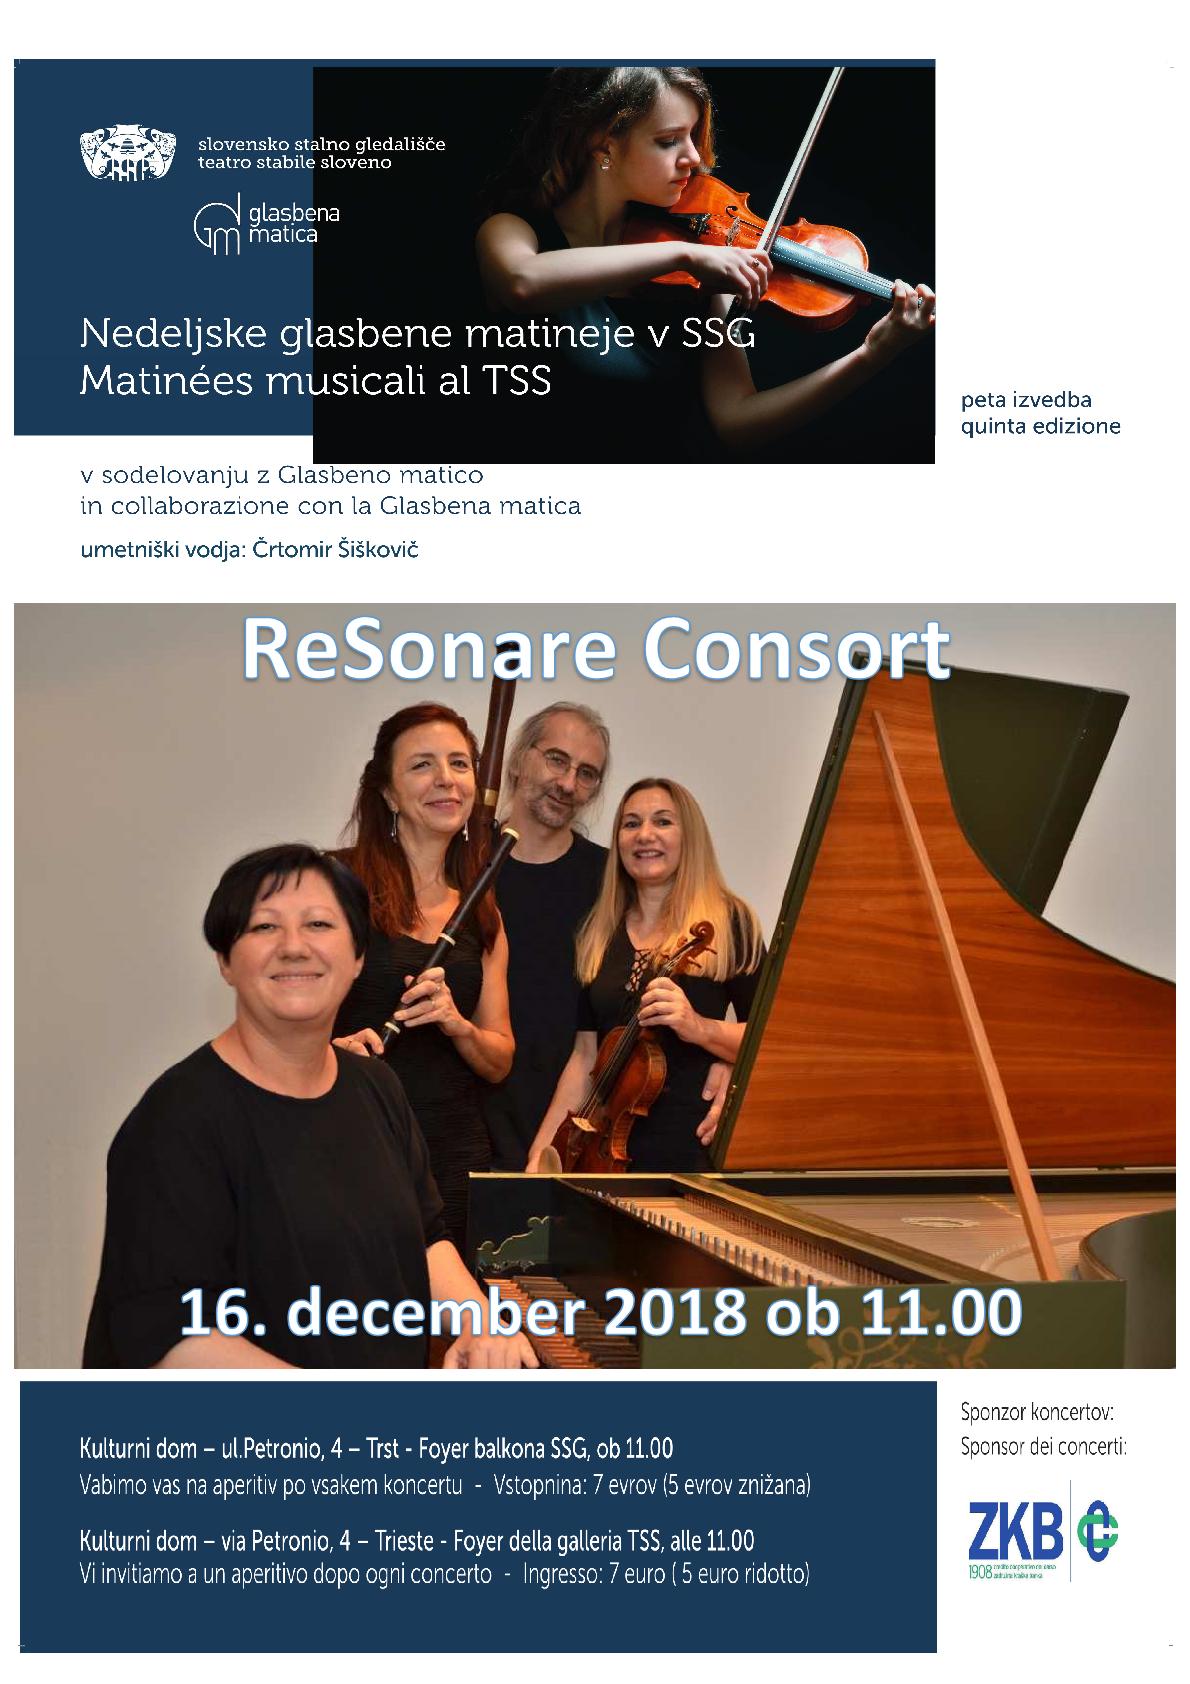 16.12.2018 ob 11.00 uri -GLASBENE MATINEJE- ReSonare Consort